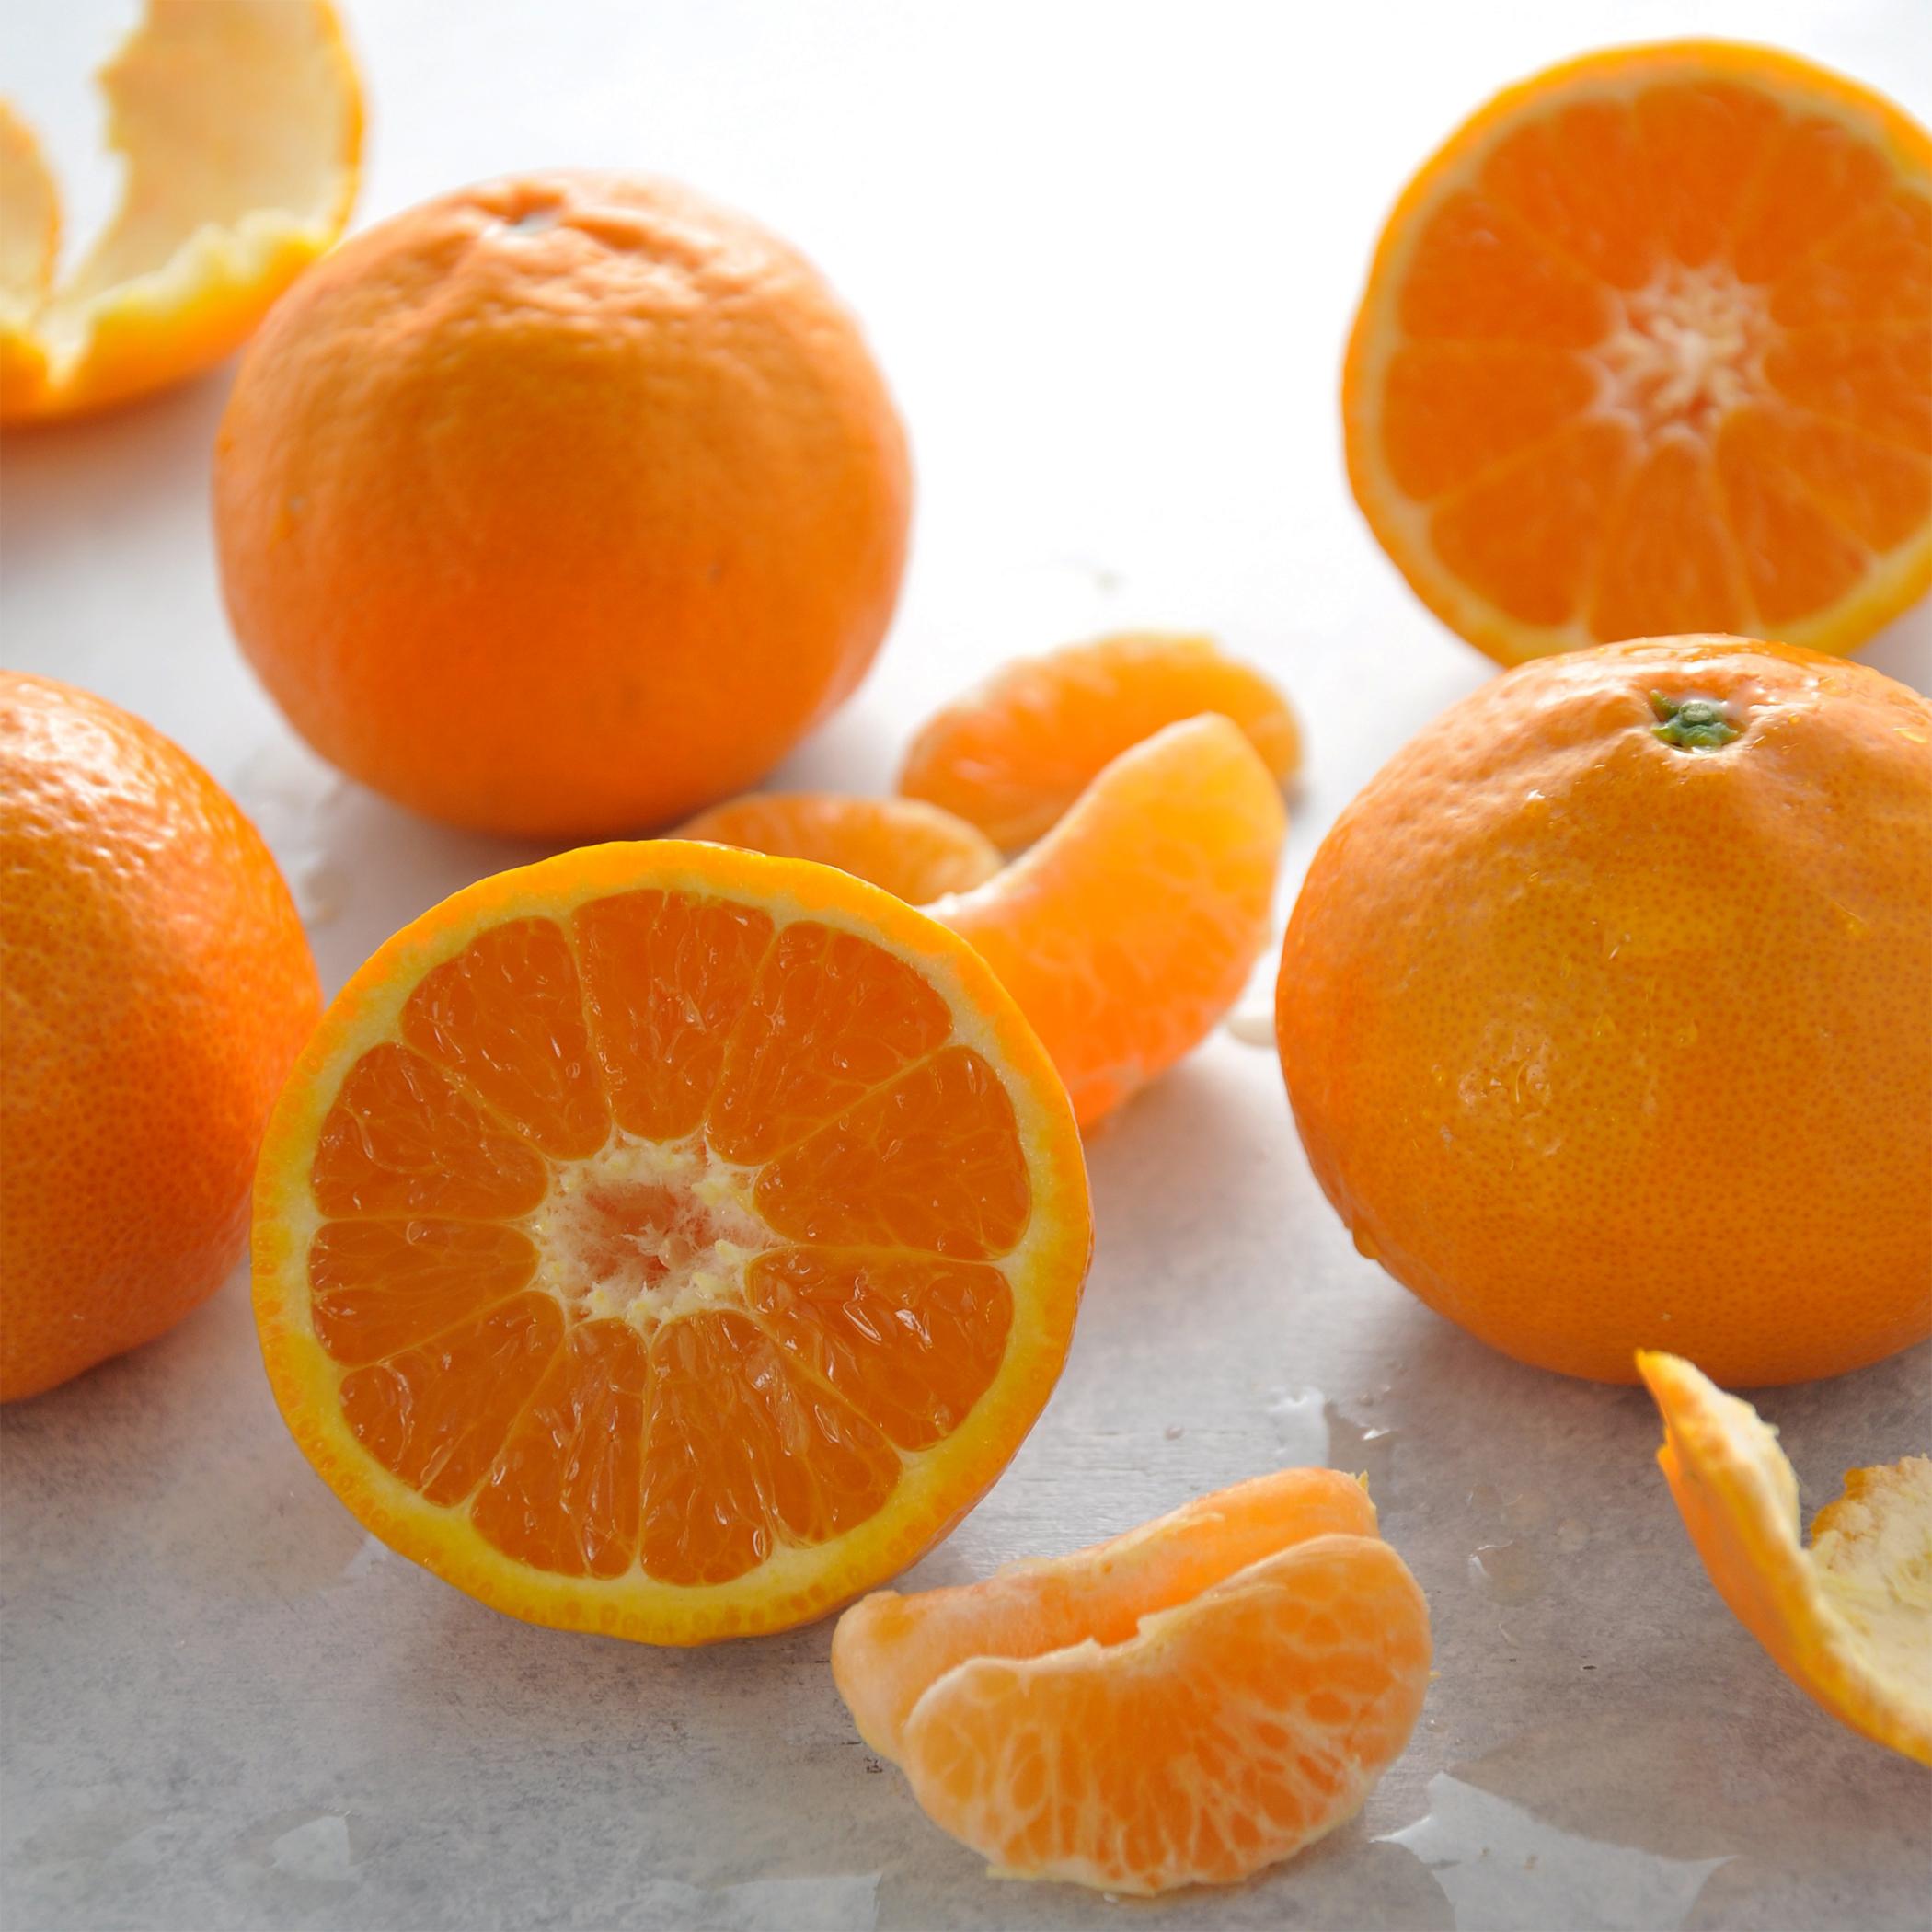 Ojai Pixie Tangerines | Meet the Farmer